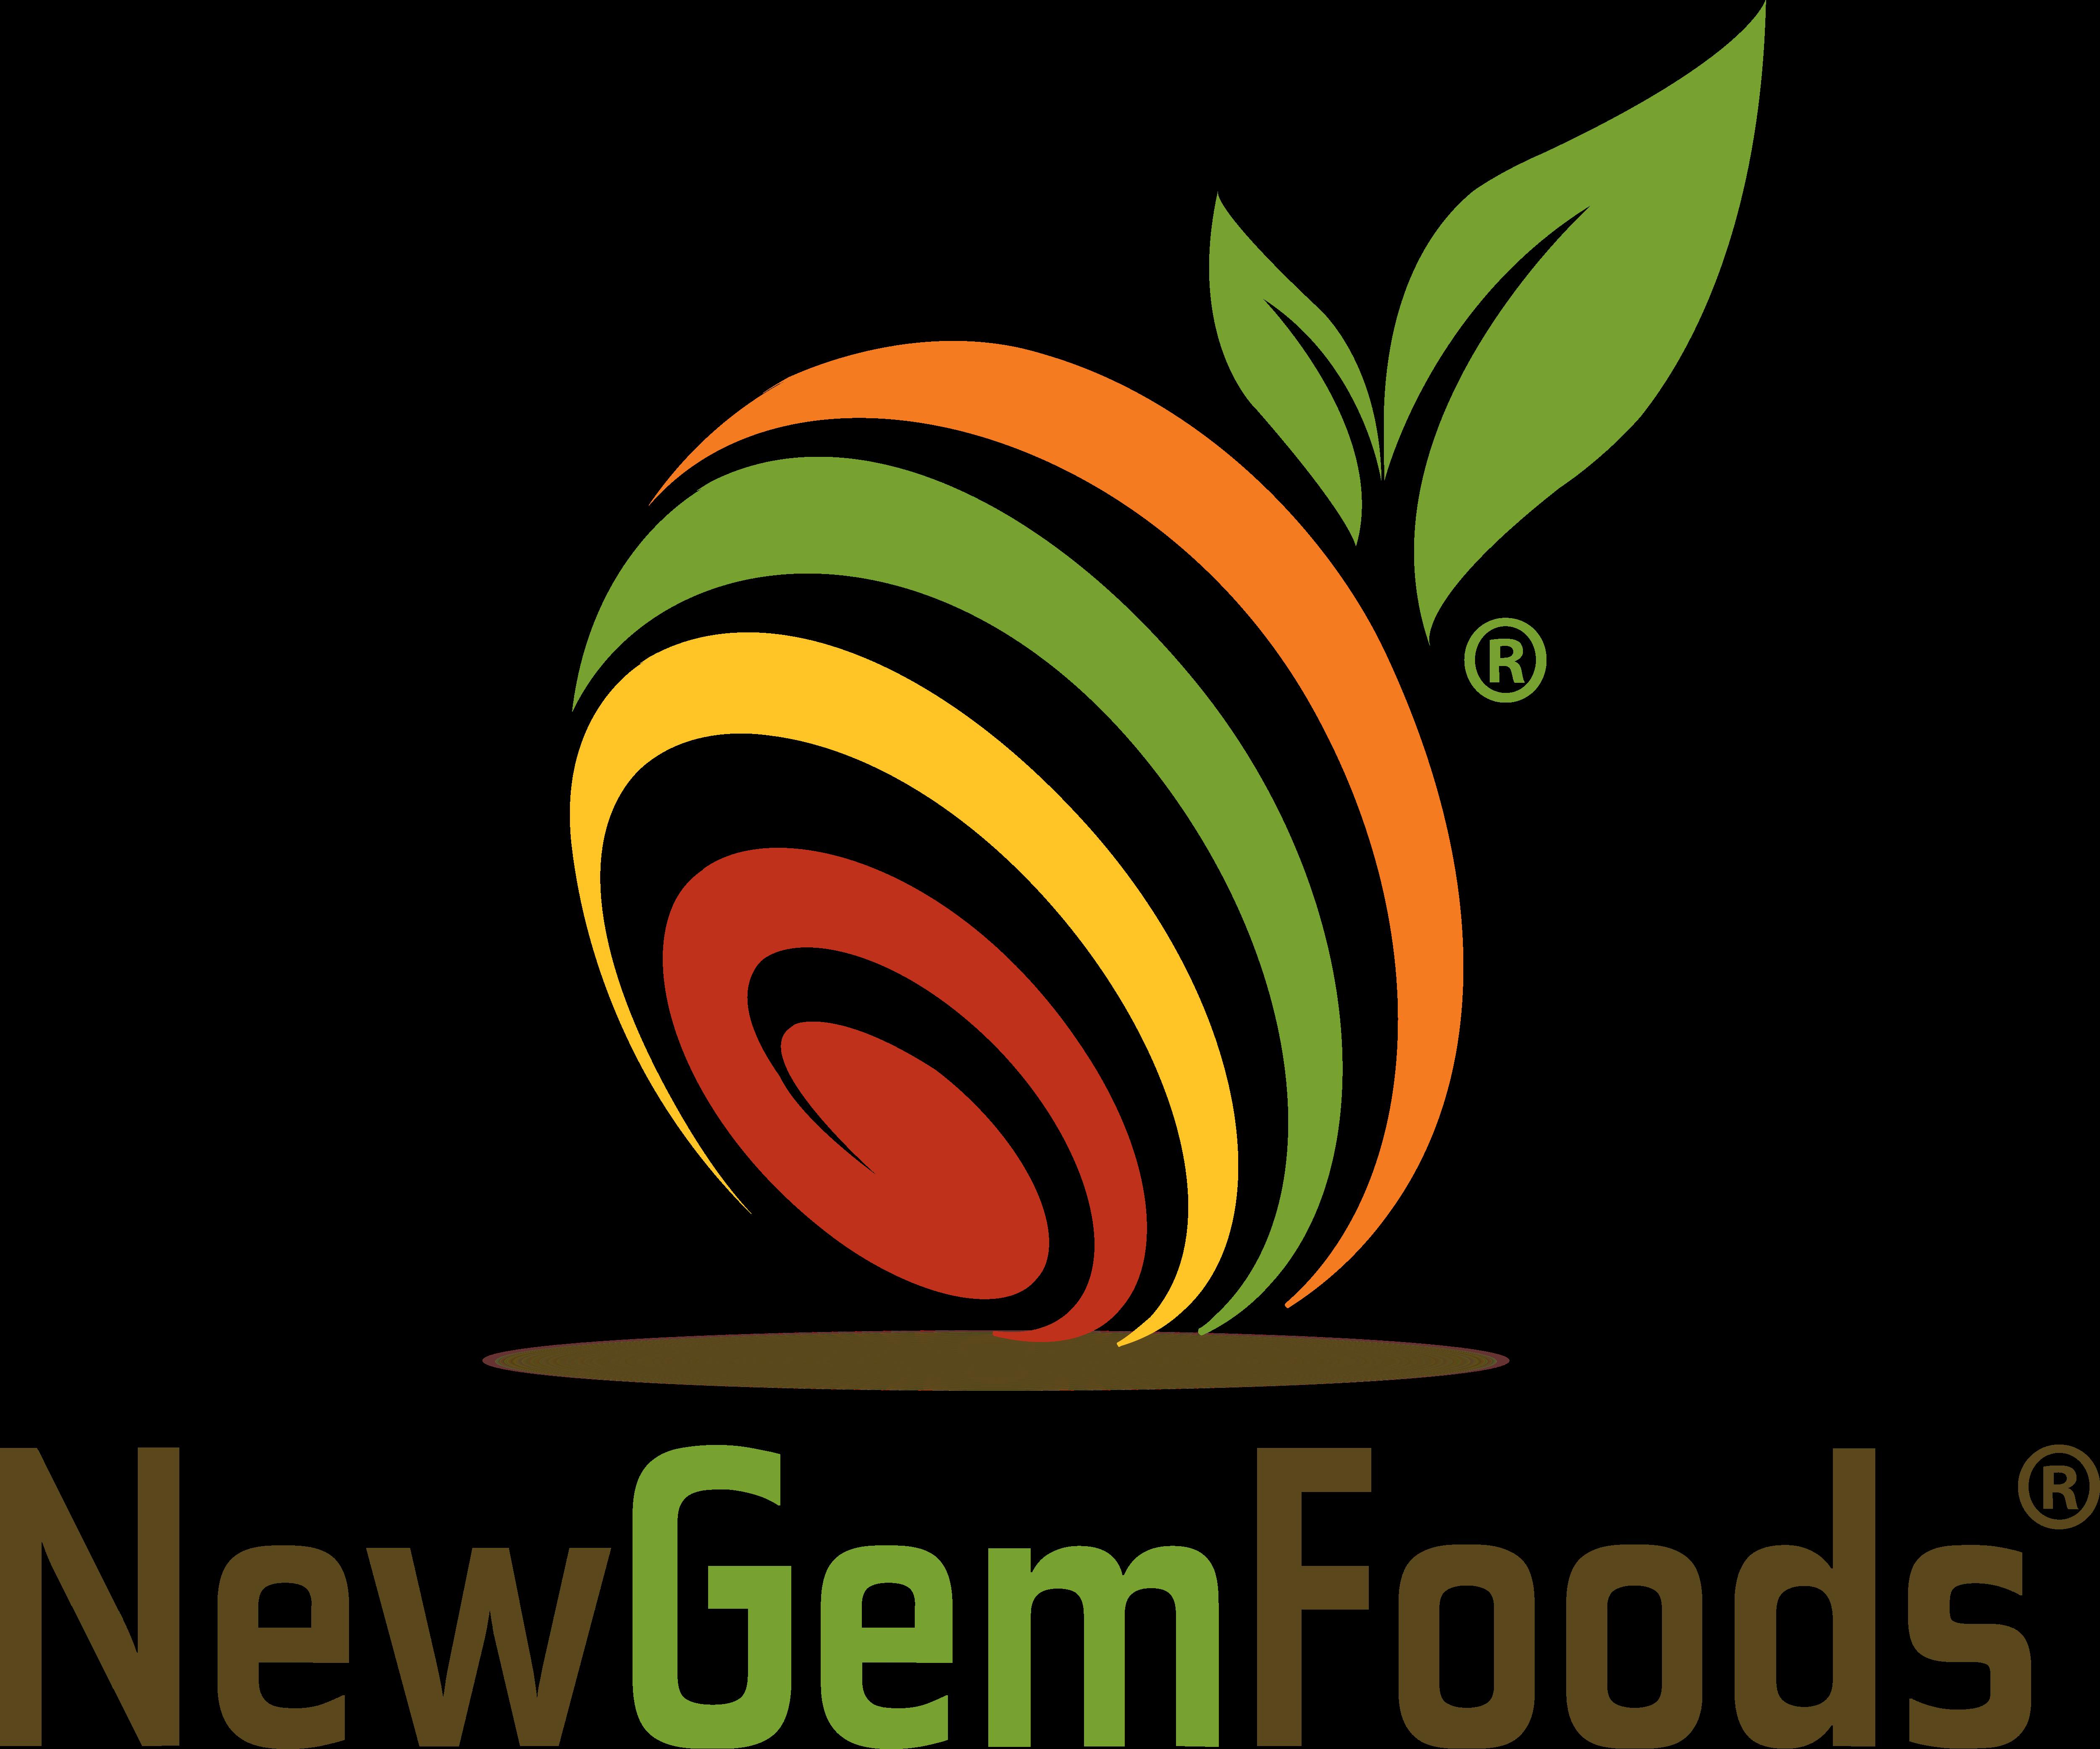 New Gem Foods – Logos Download